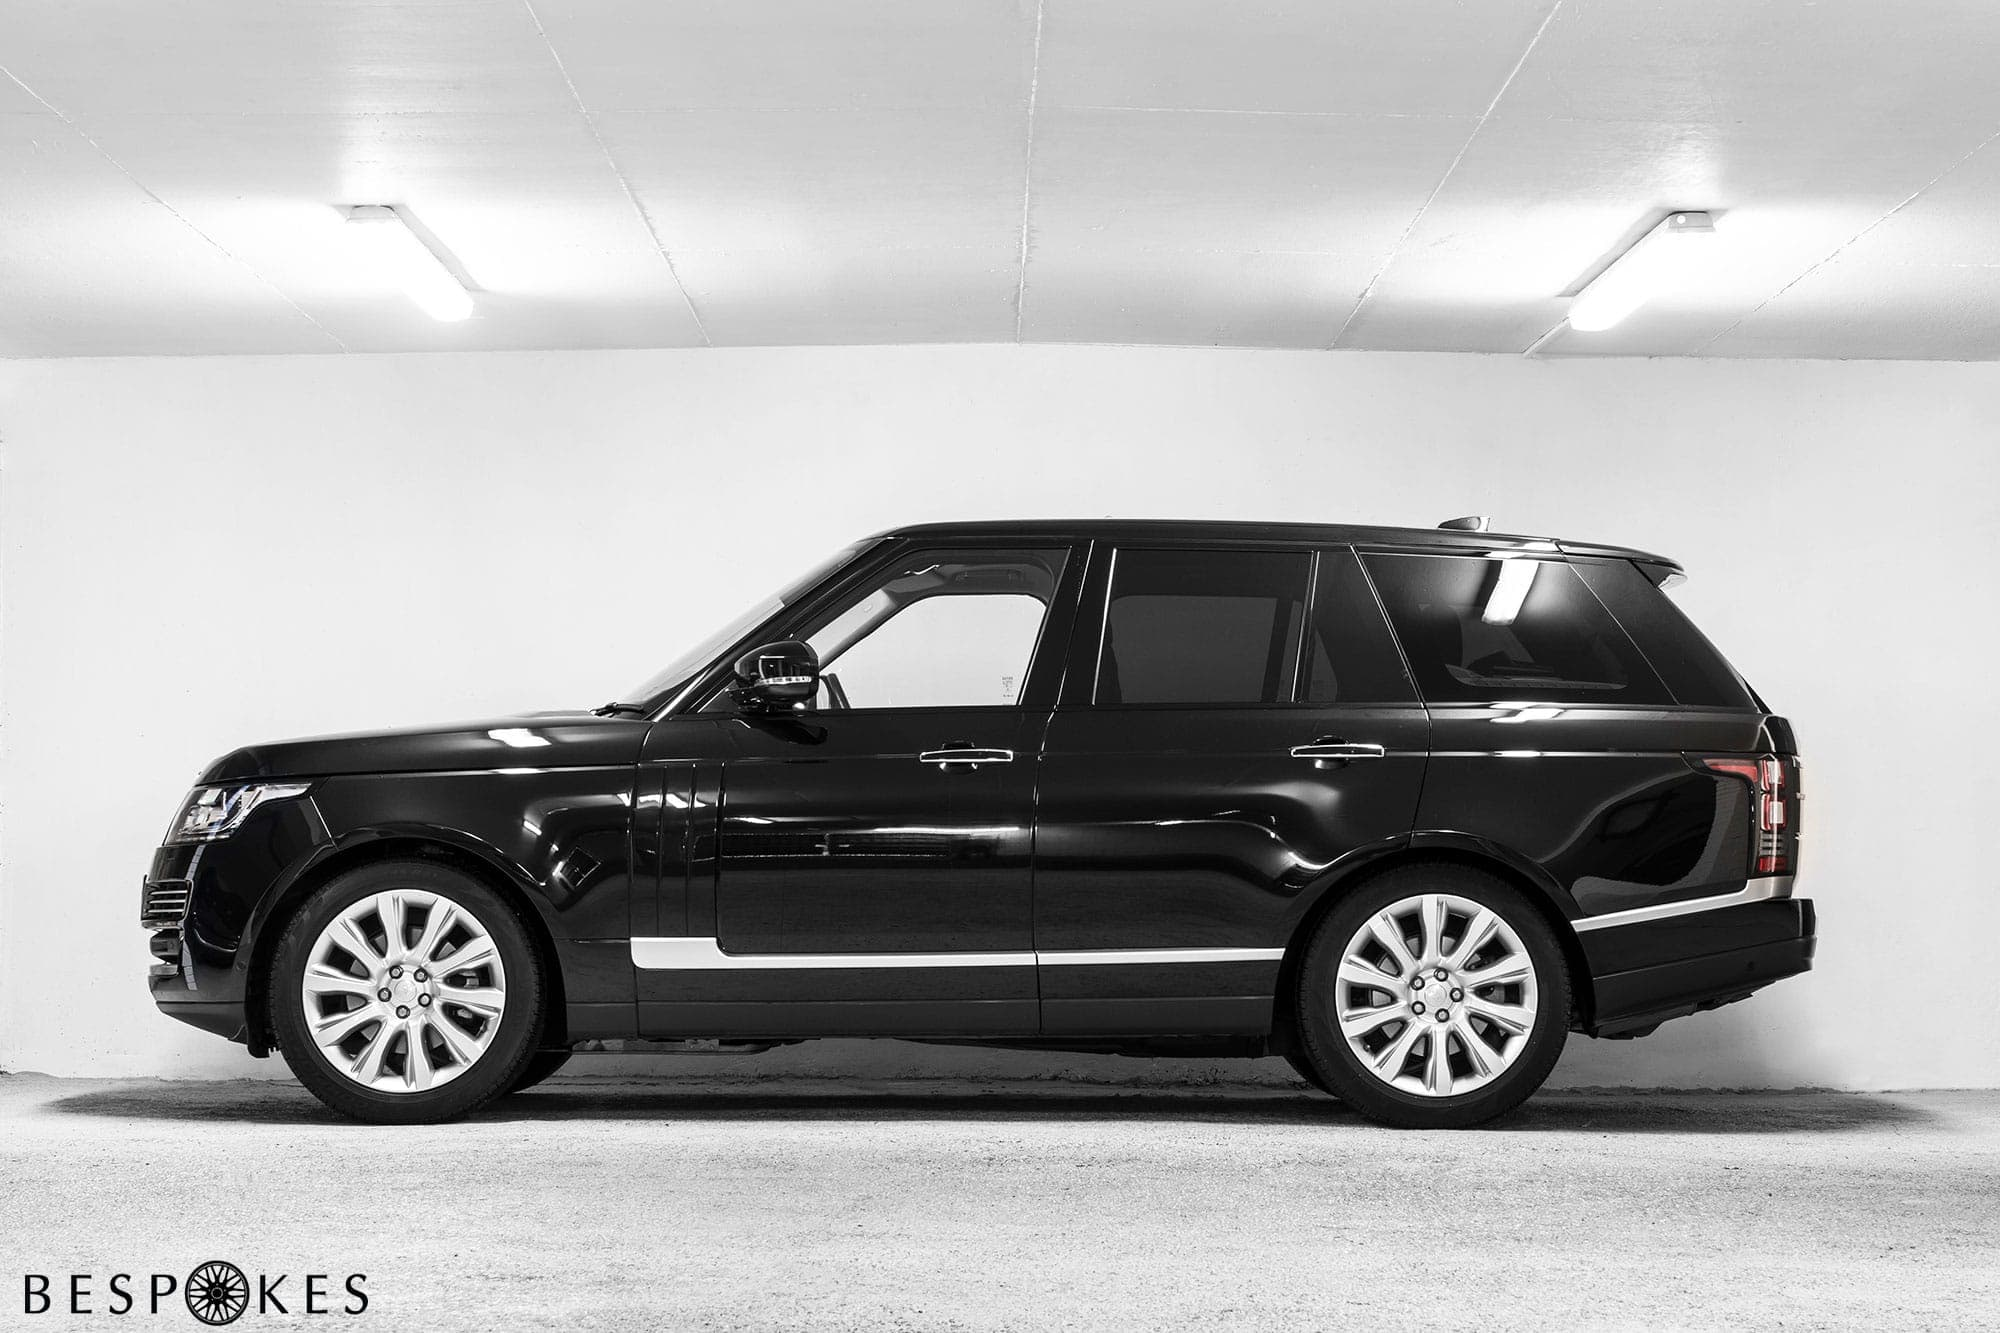 Range Rover Vogue: Range Rover Vogue SE